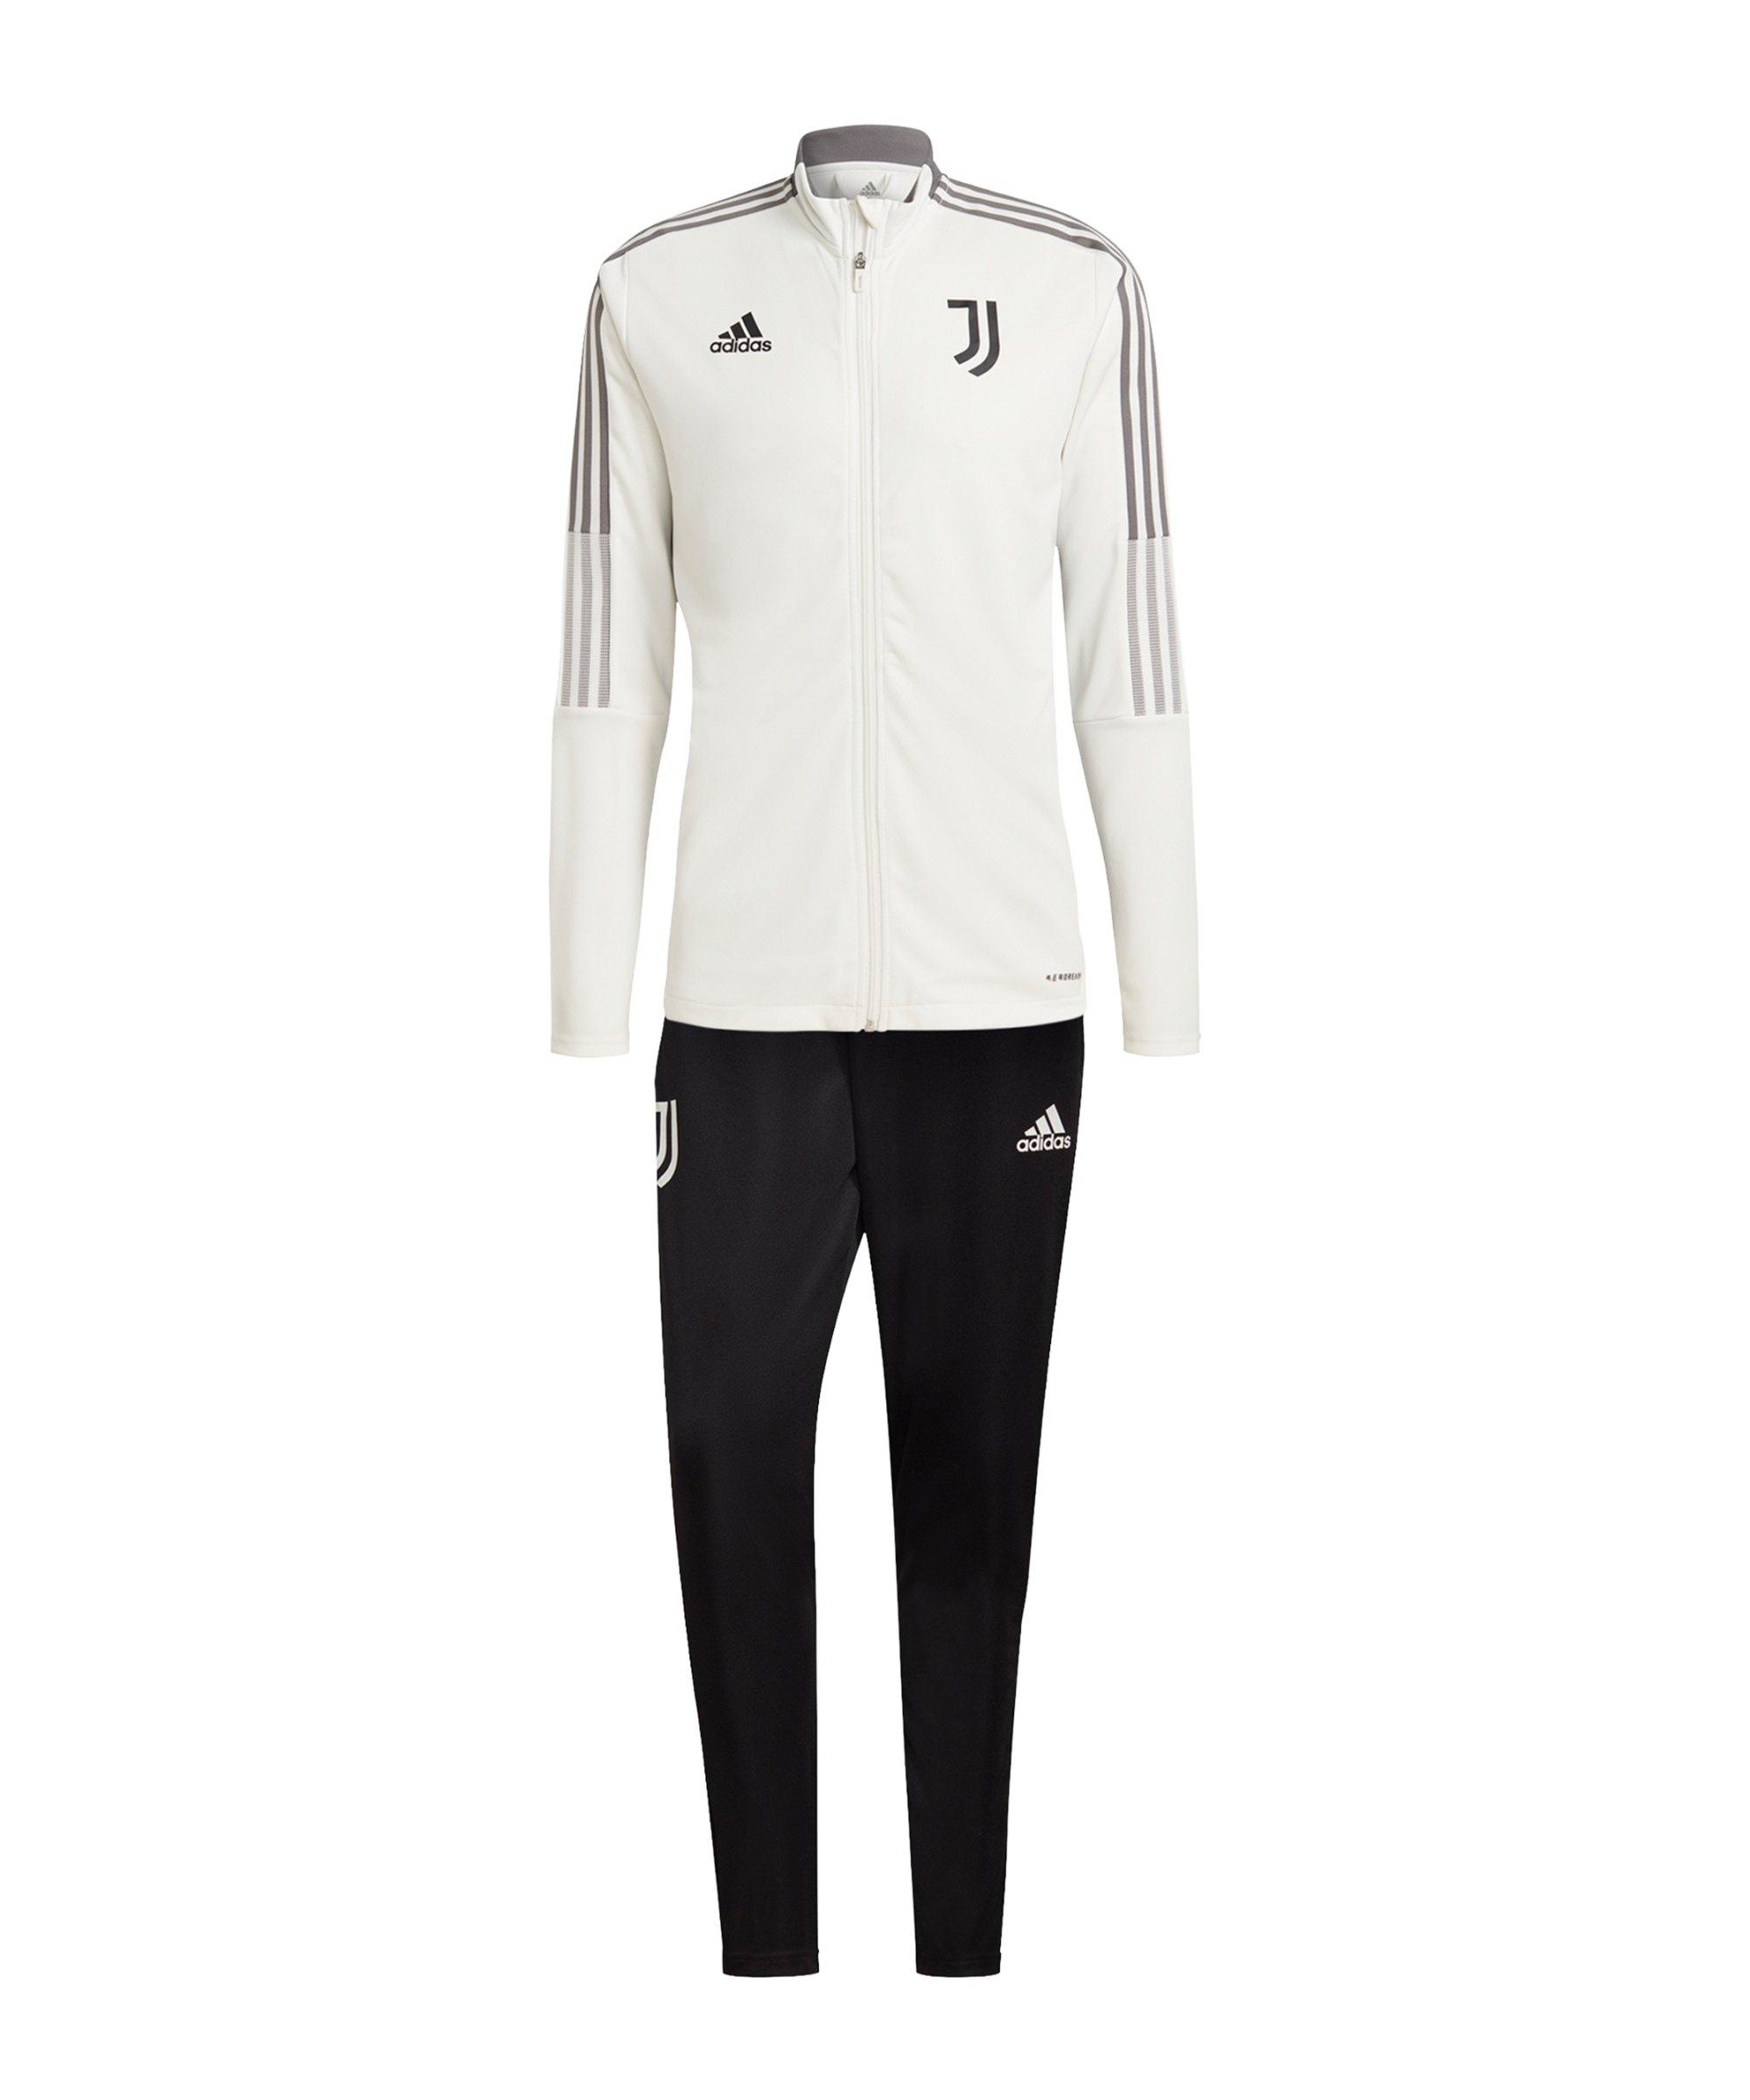 adidas Juventus Turin Trainingsanzug Weiss - weiss